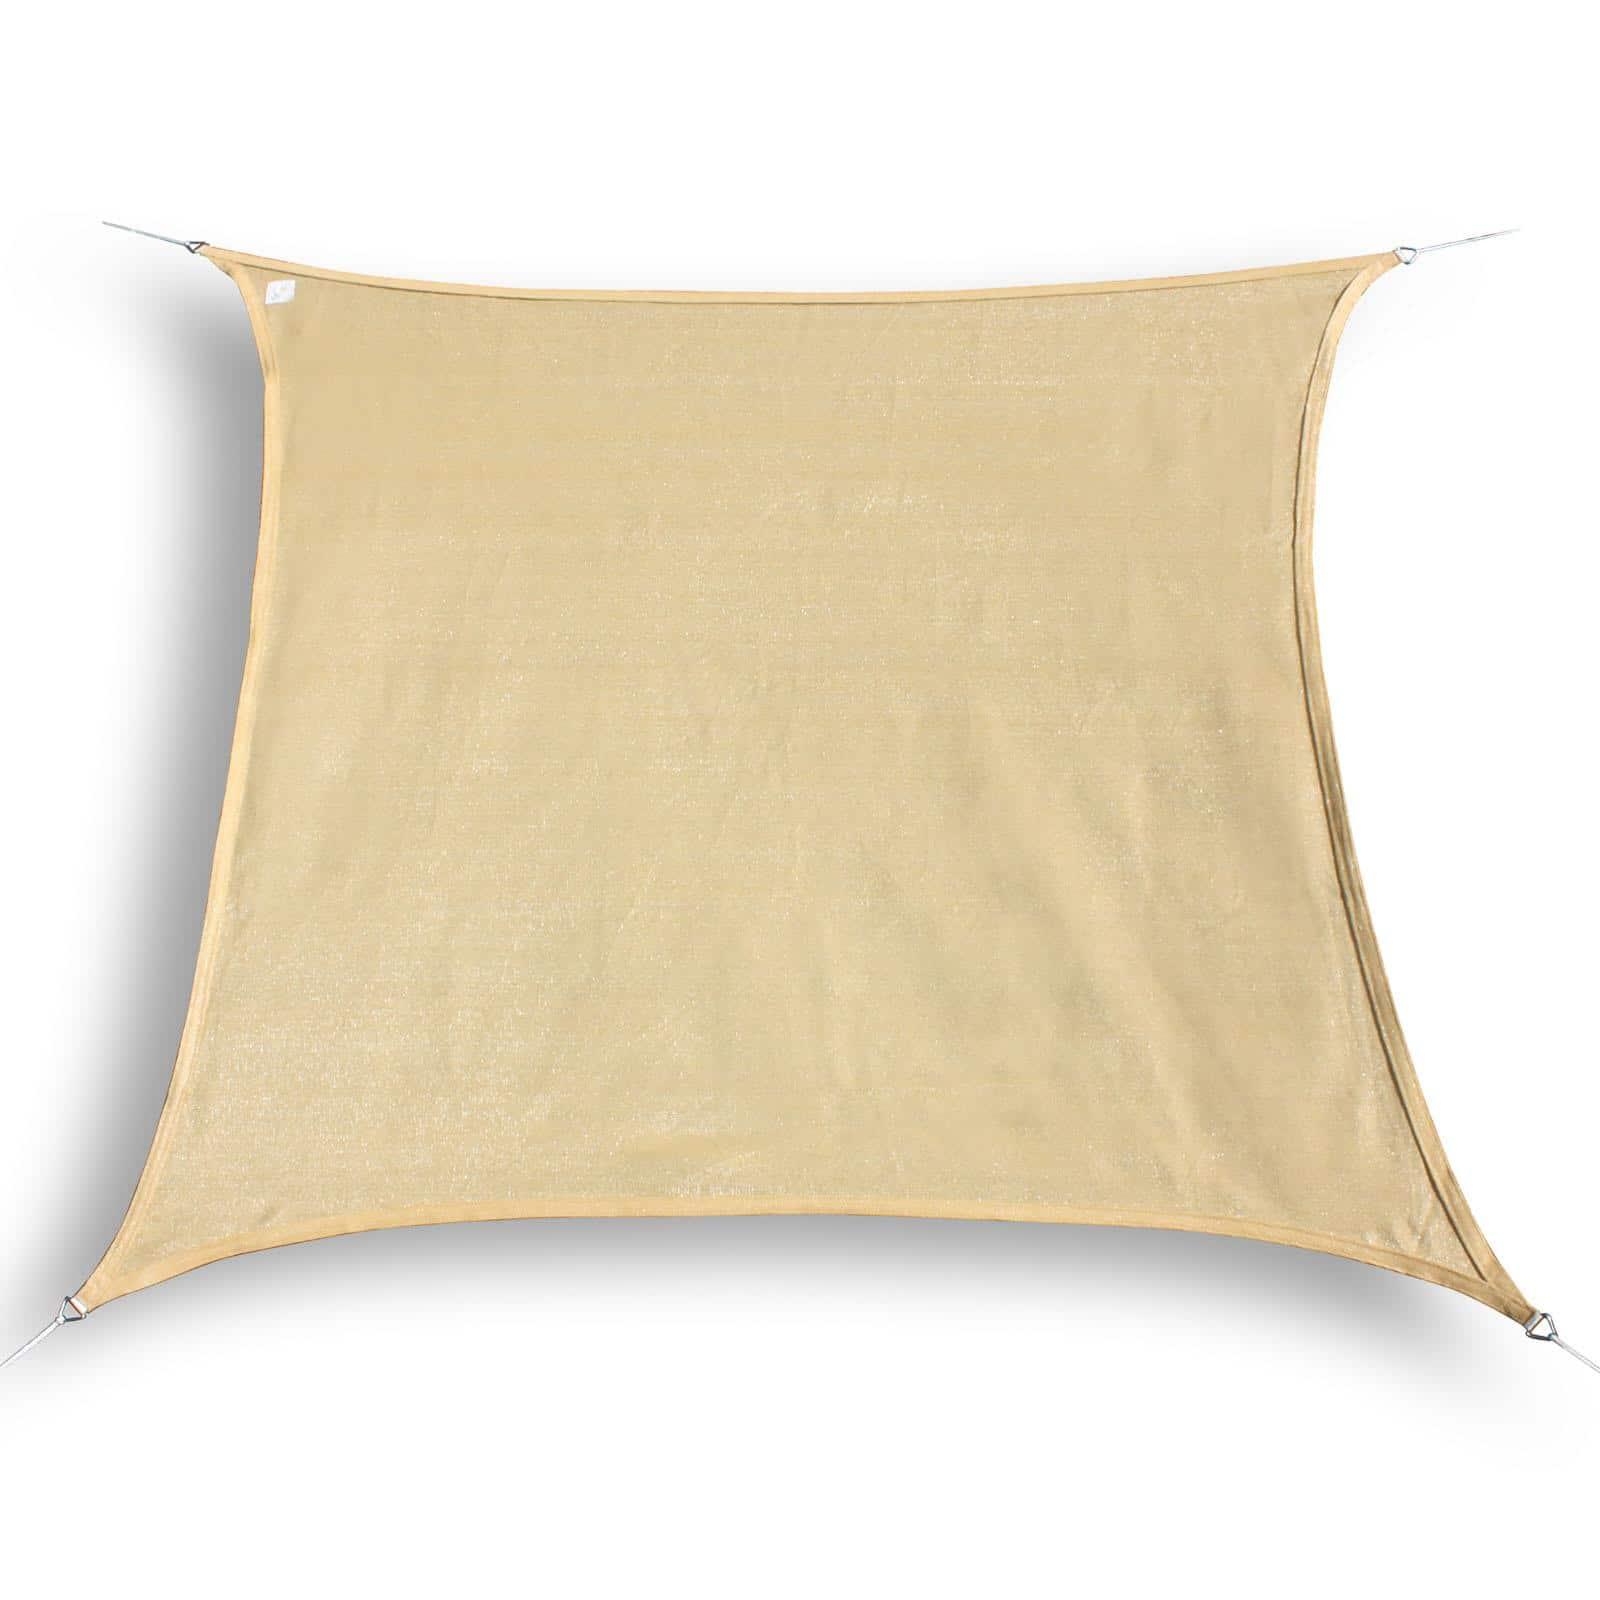 hanSe® Schaduwdoek Vierkant Waterdoorlatend 7x7 m - zonnedoek - Zand